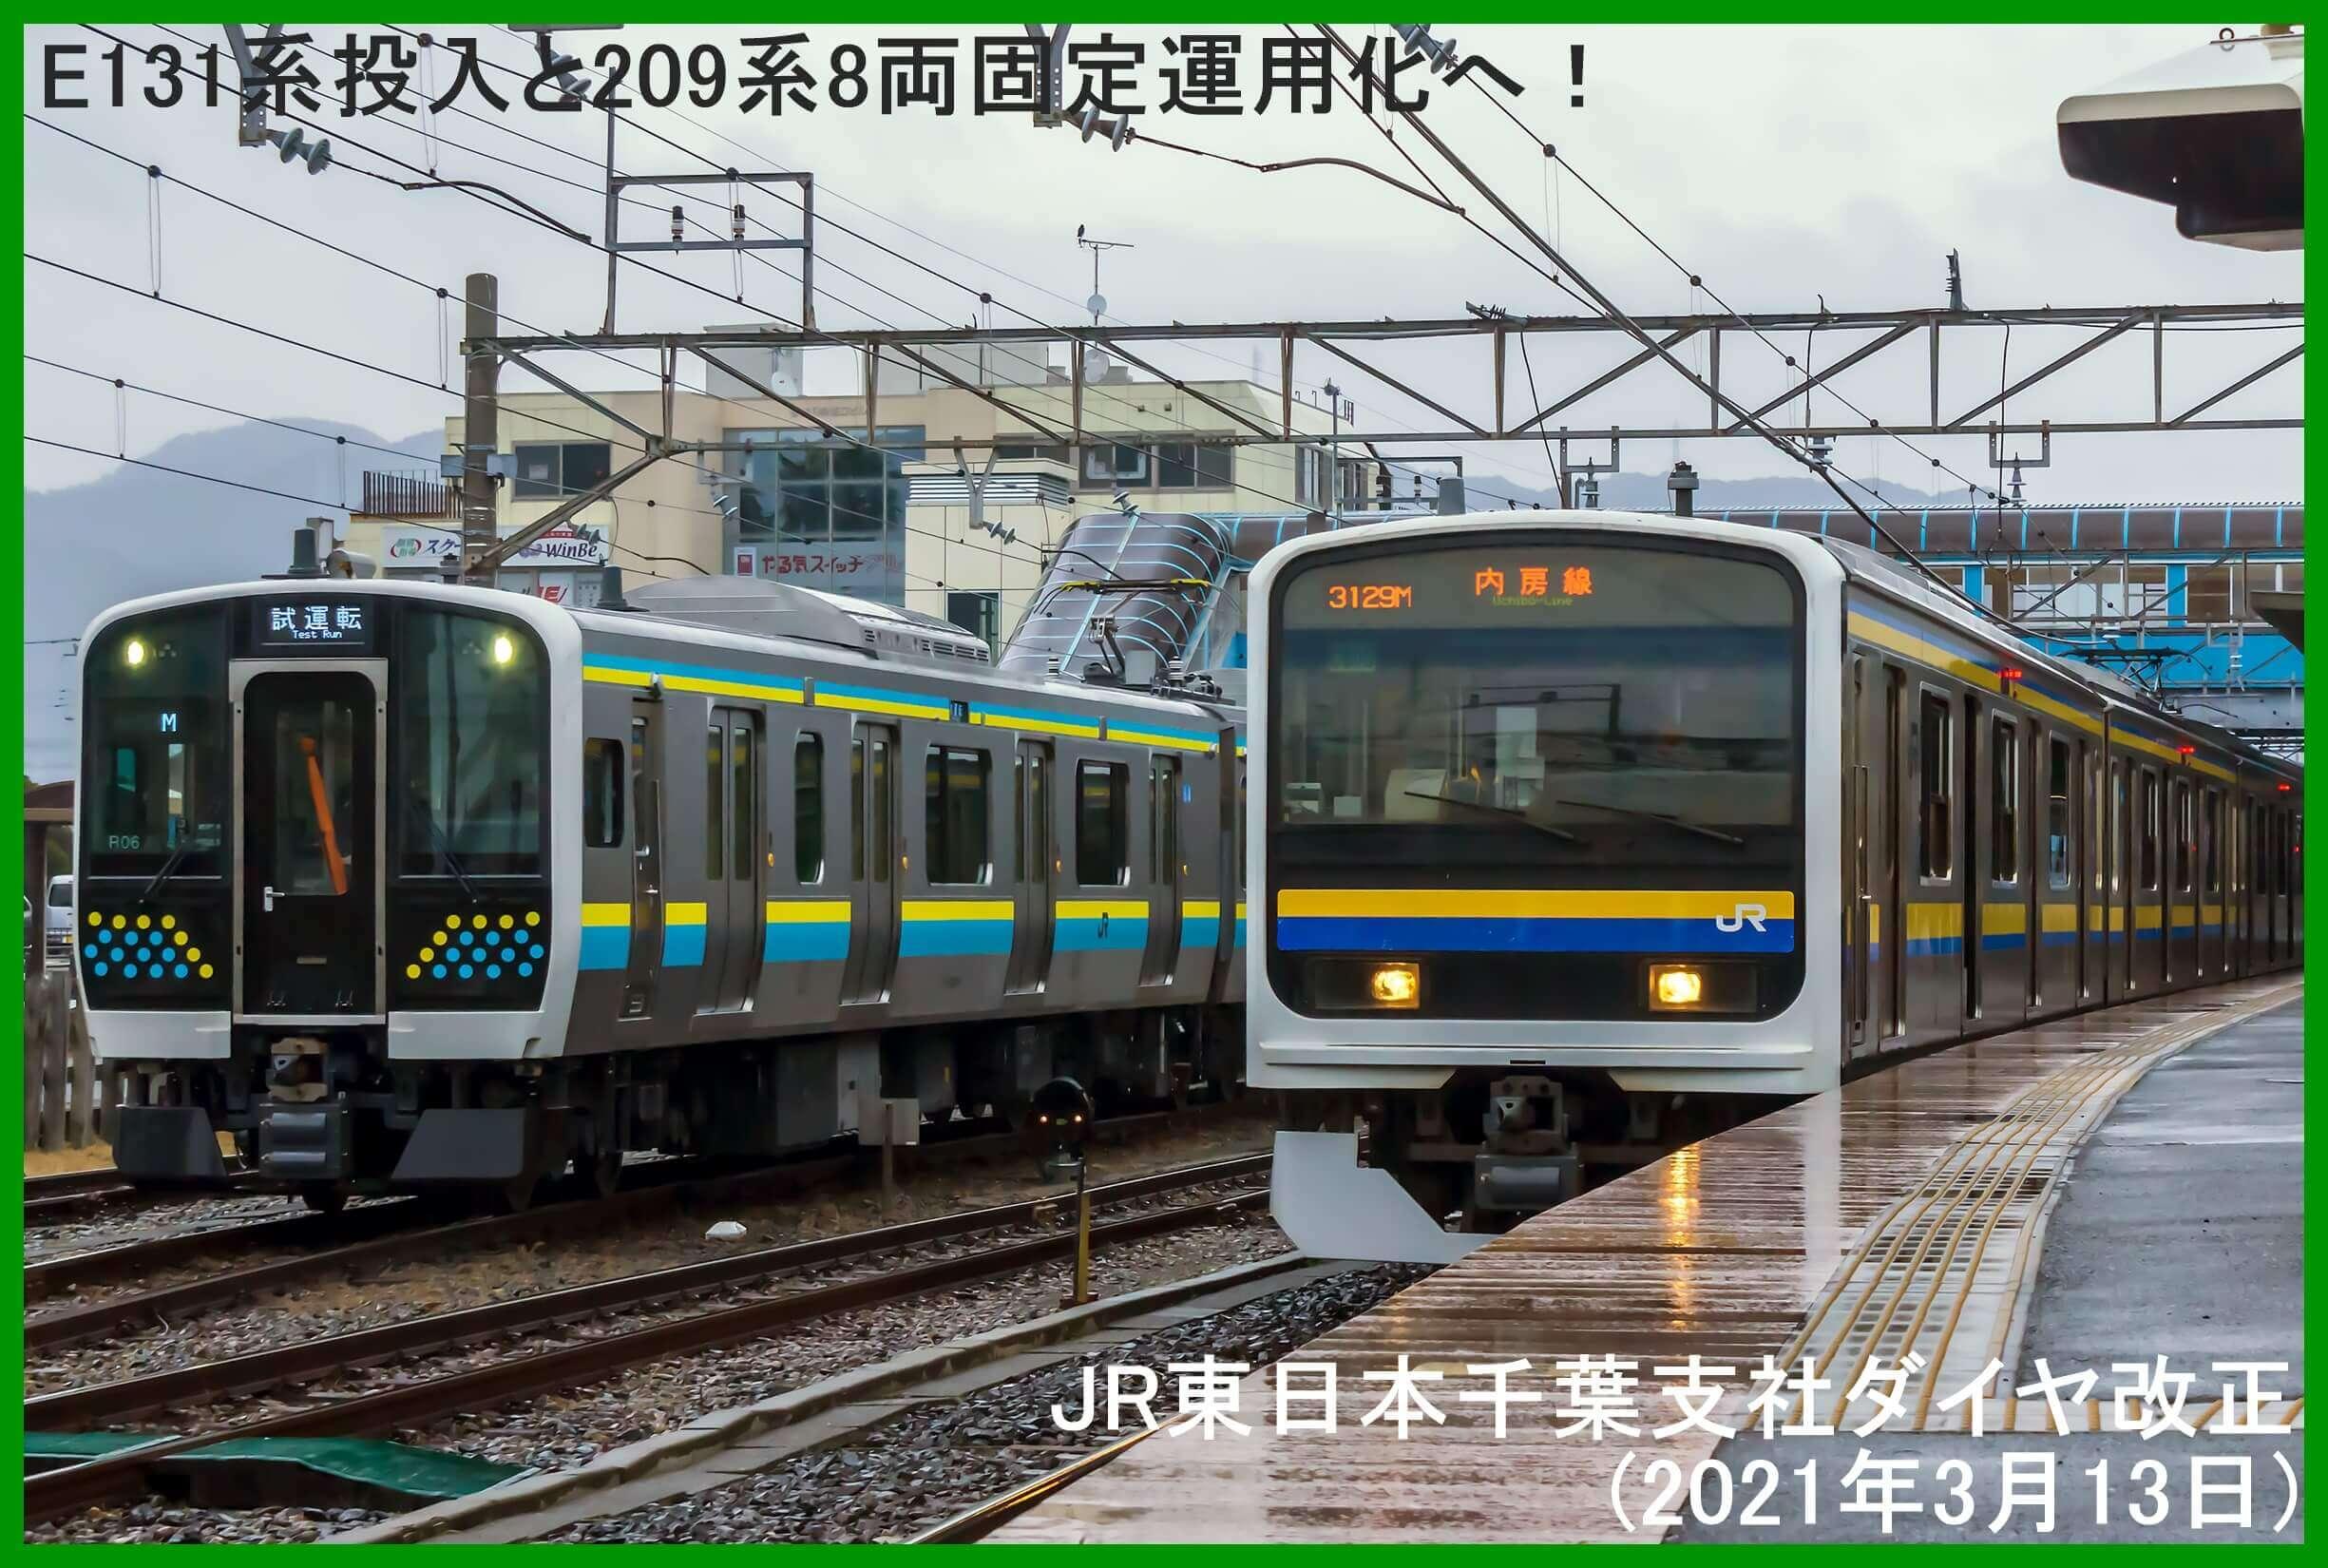 E131系投入と209系8両固定運用化へ! JR東日本千葉支社ダイヤ改正(2021年3月13日)